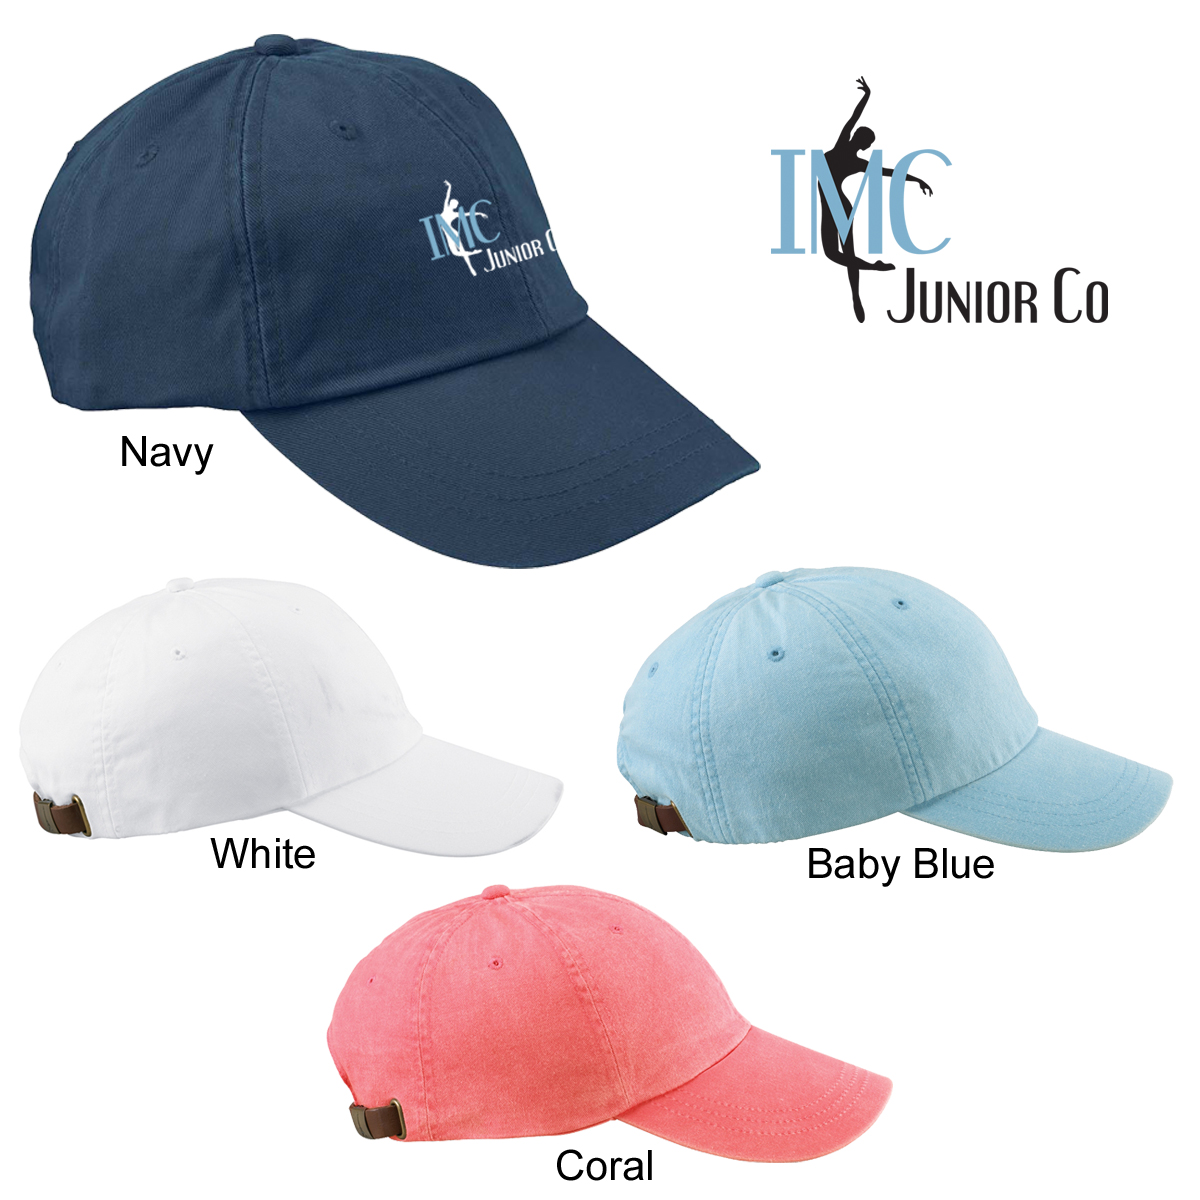 IMC JR COMPANY - BASEBALL CAP